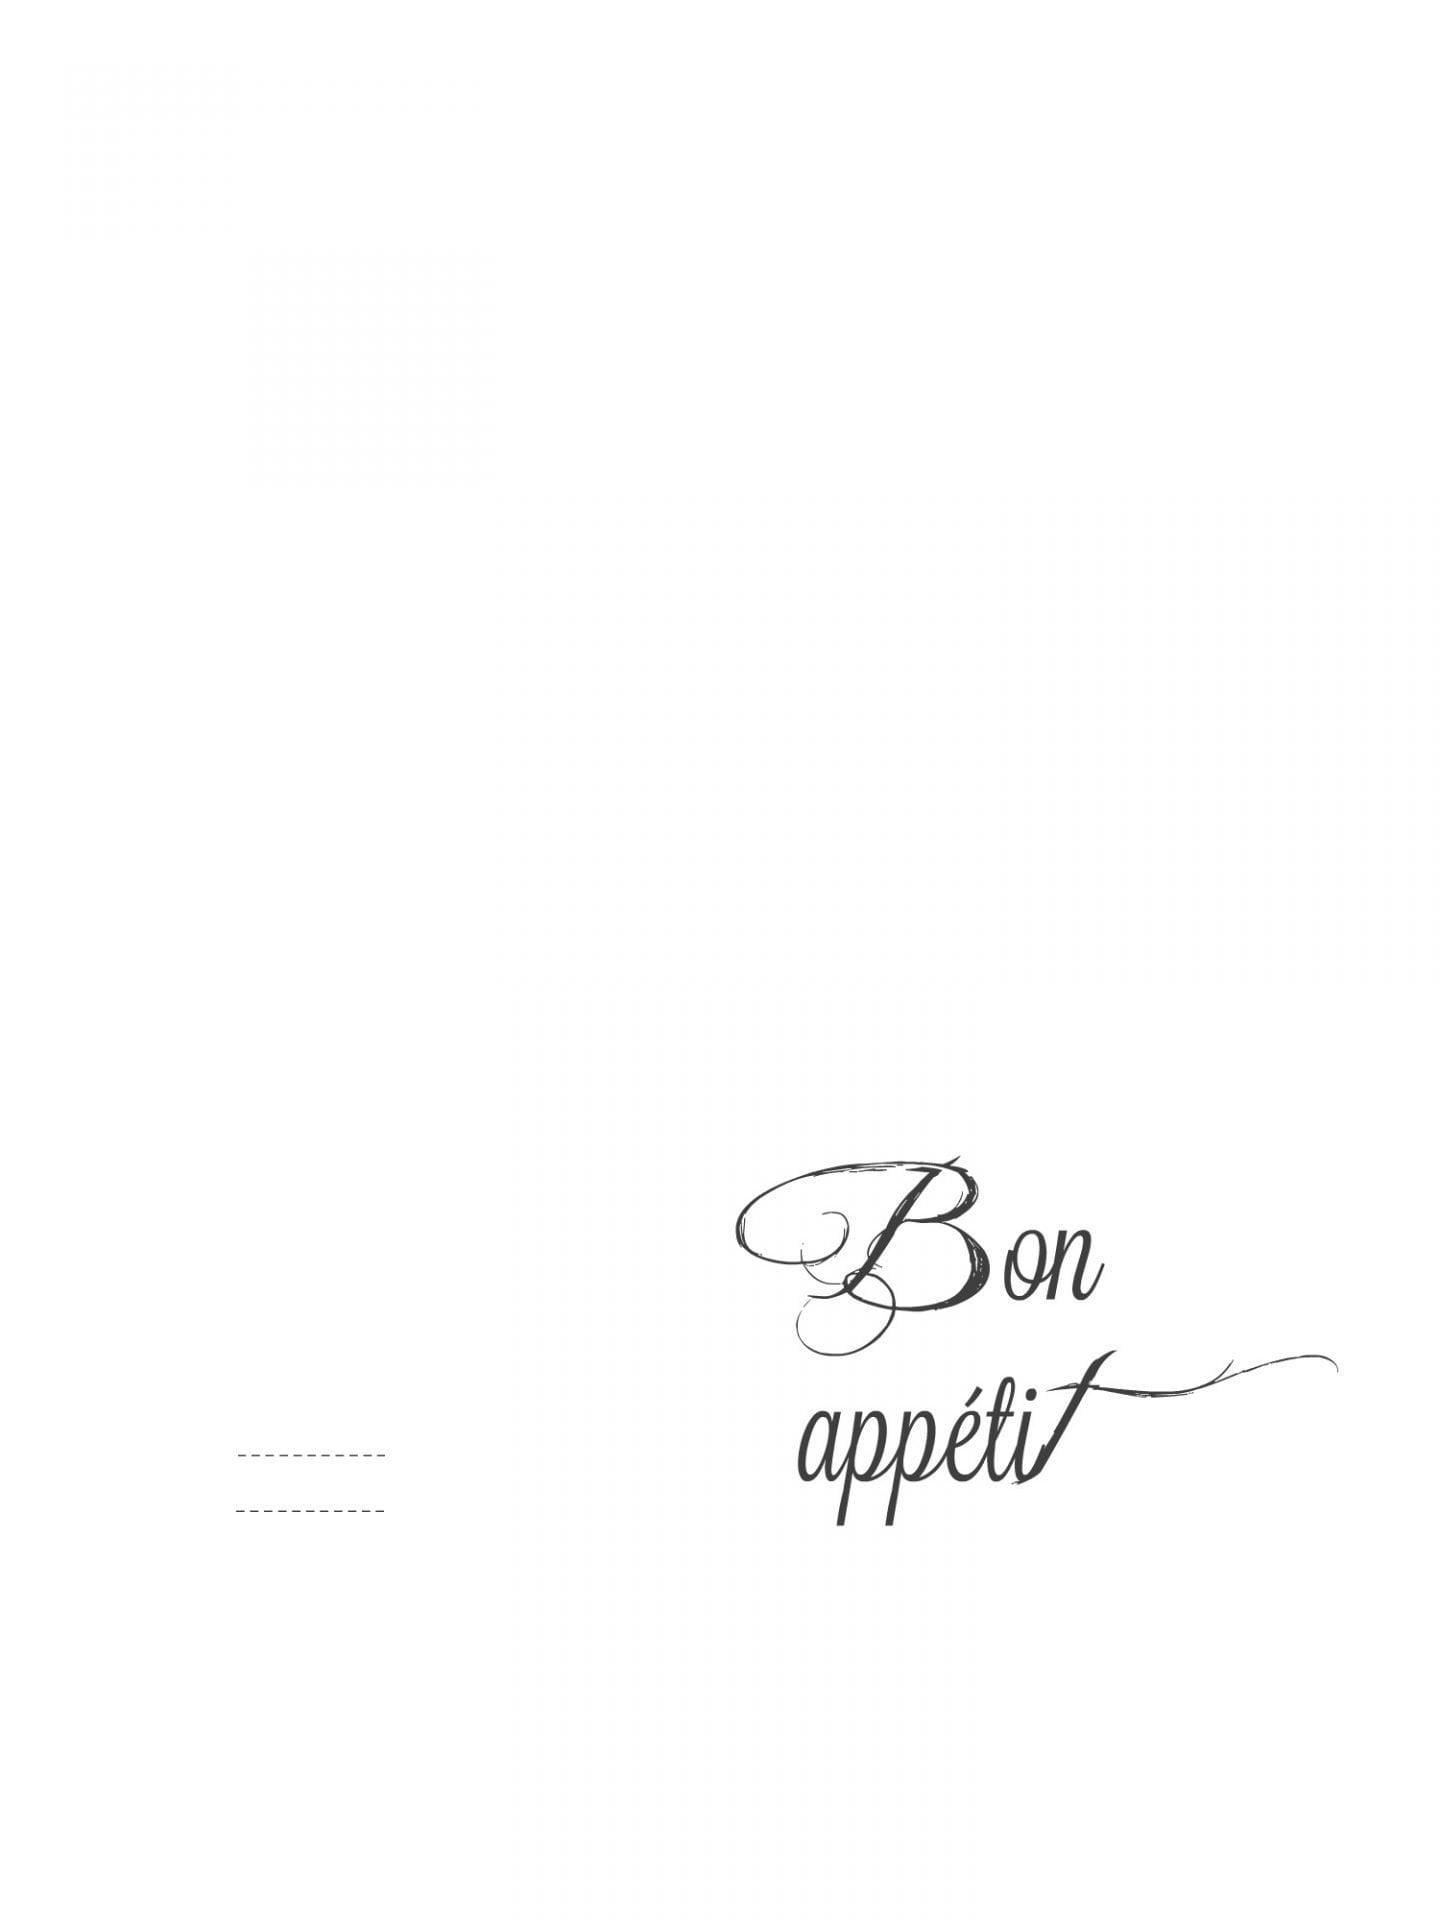 free printable Bon appétit